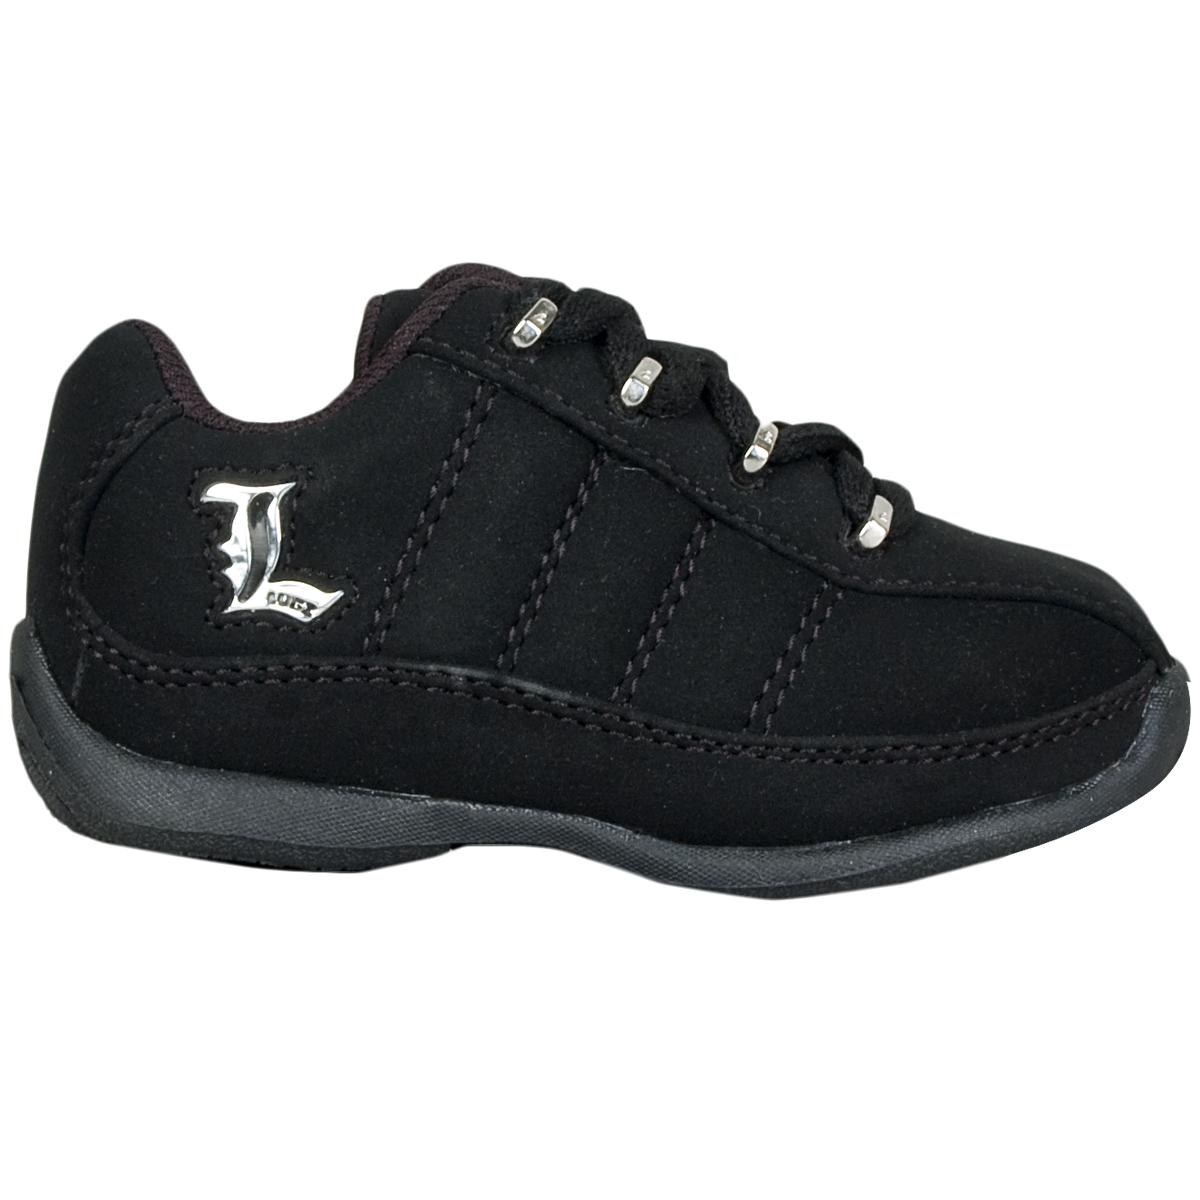 Lugz Shoes Black Friday